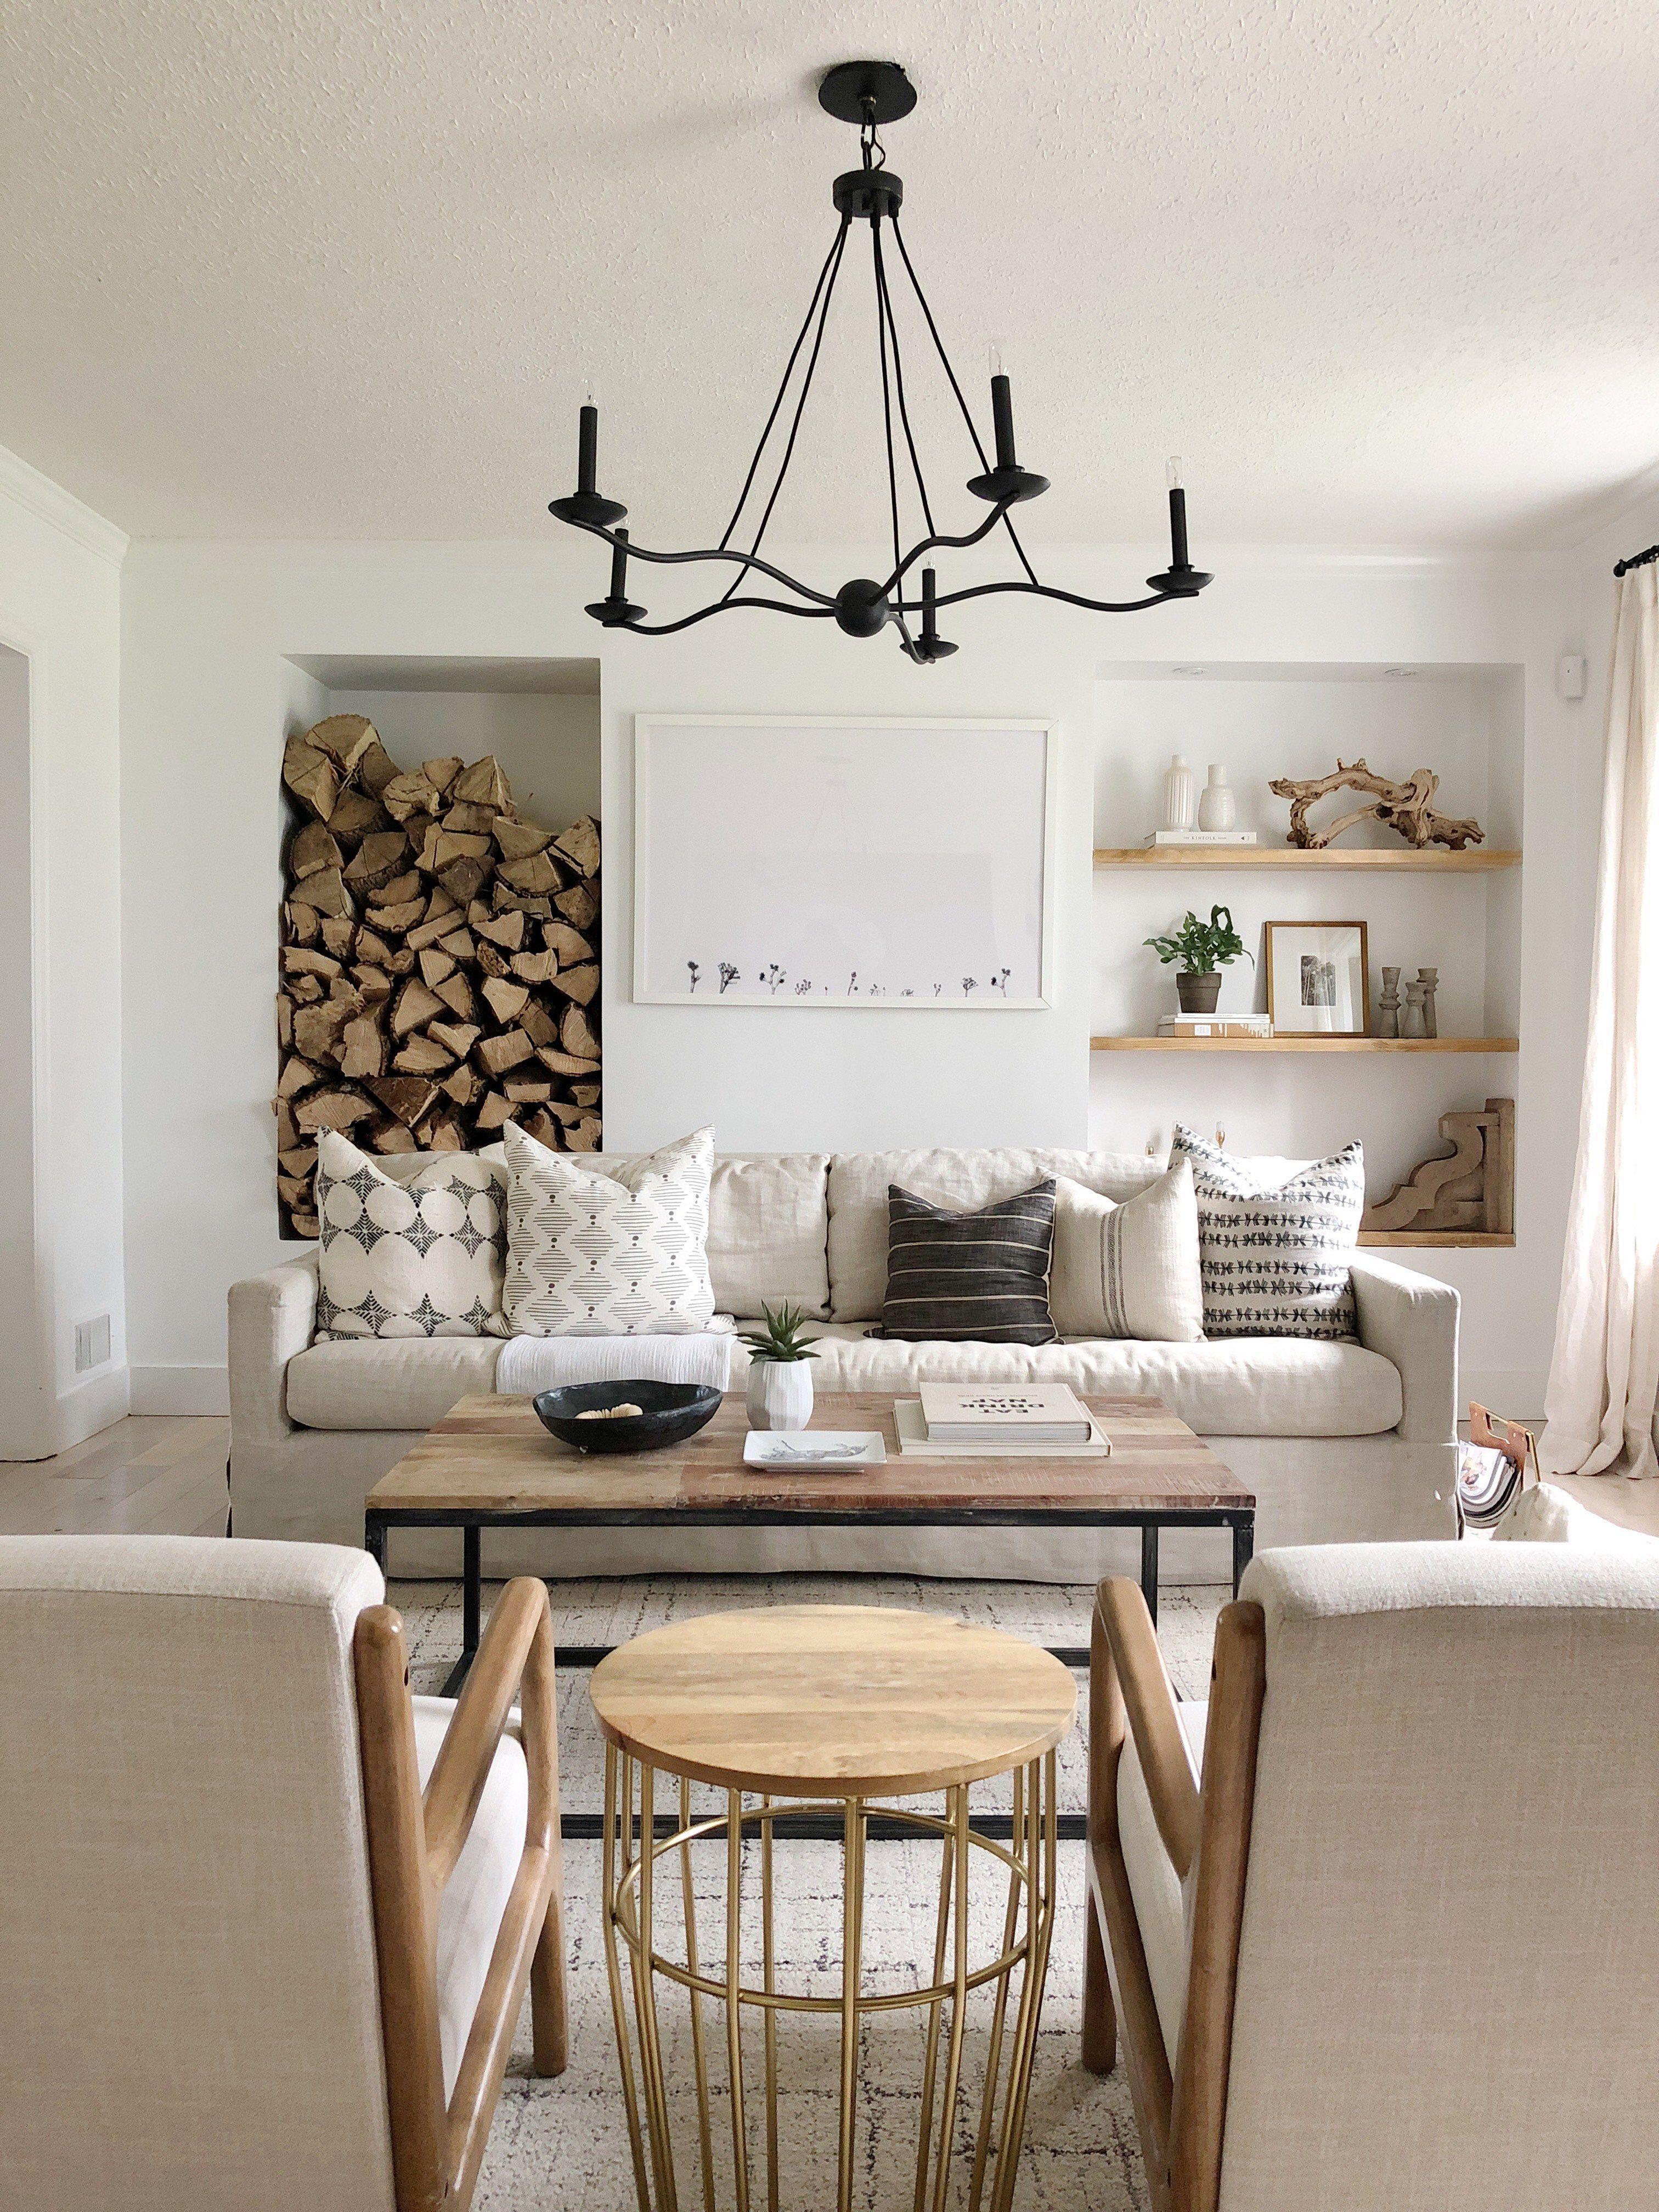 15 Most Beautiful Rustic Home Interior Decoration Ideas Rustic Home Interiors Living Room Designs Living Room Lighting